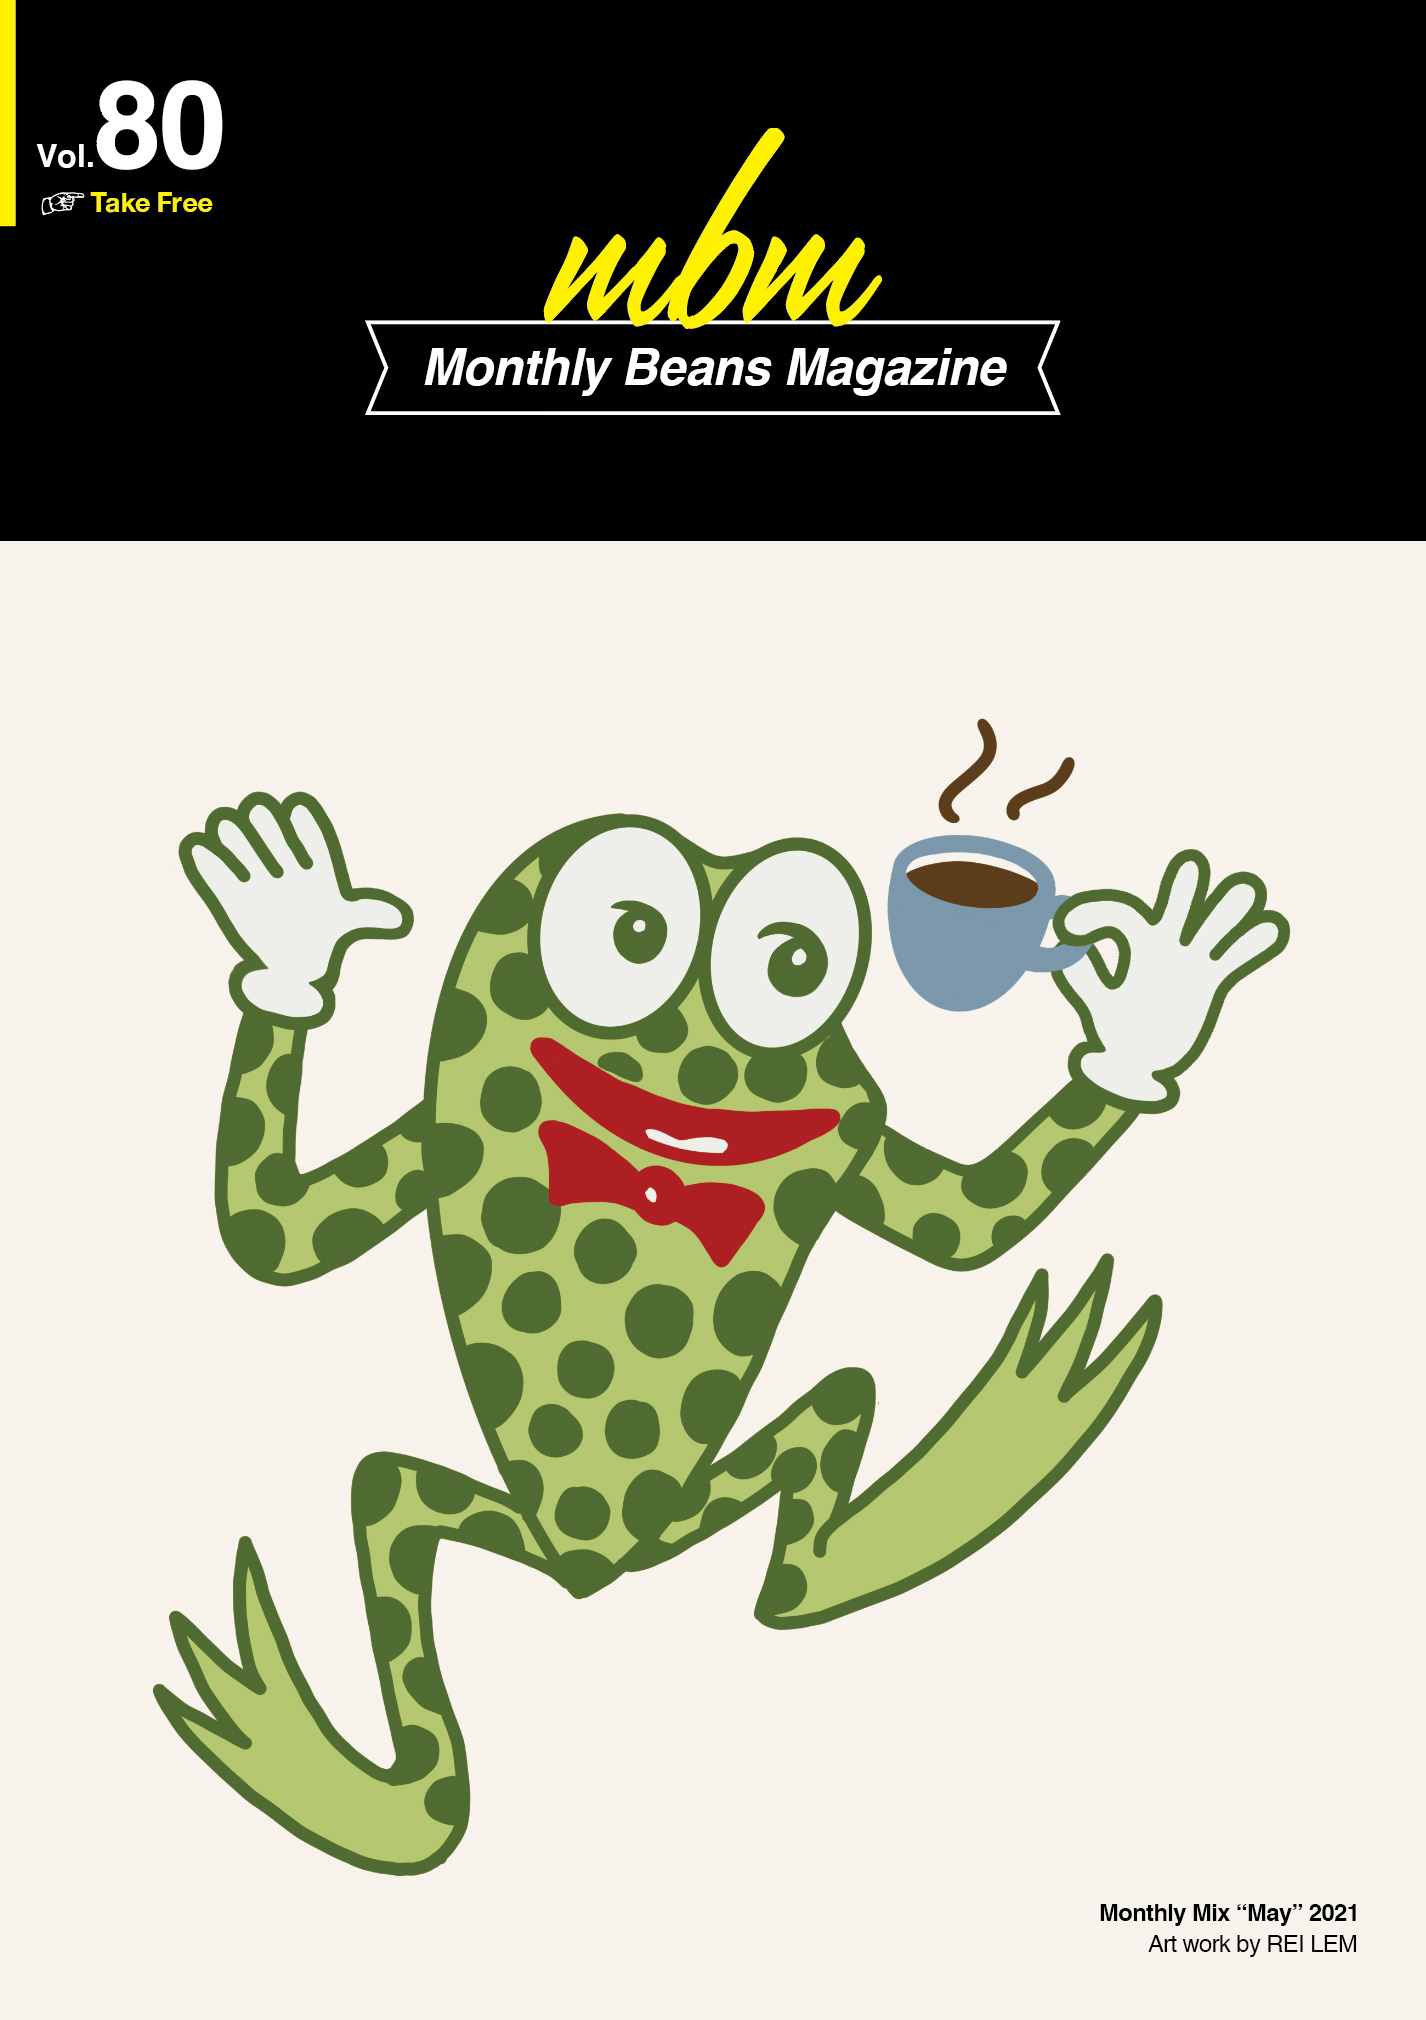 Monthly Beans Magazine 2021年5月号 [vol.80]